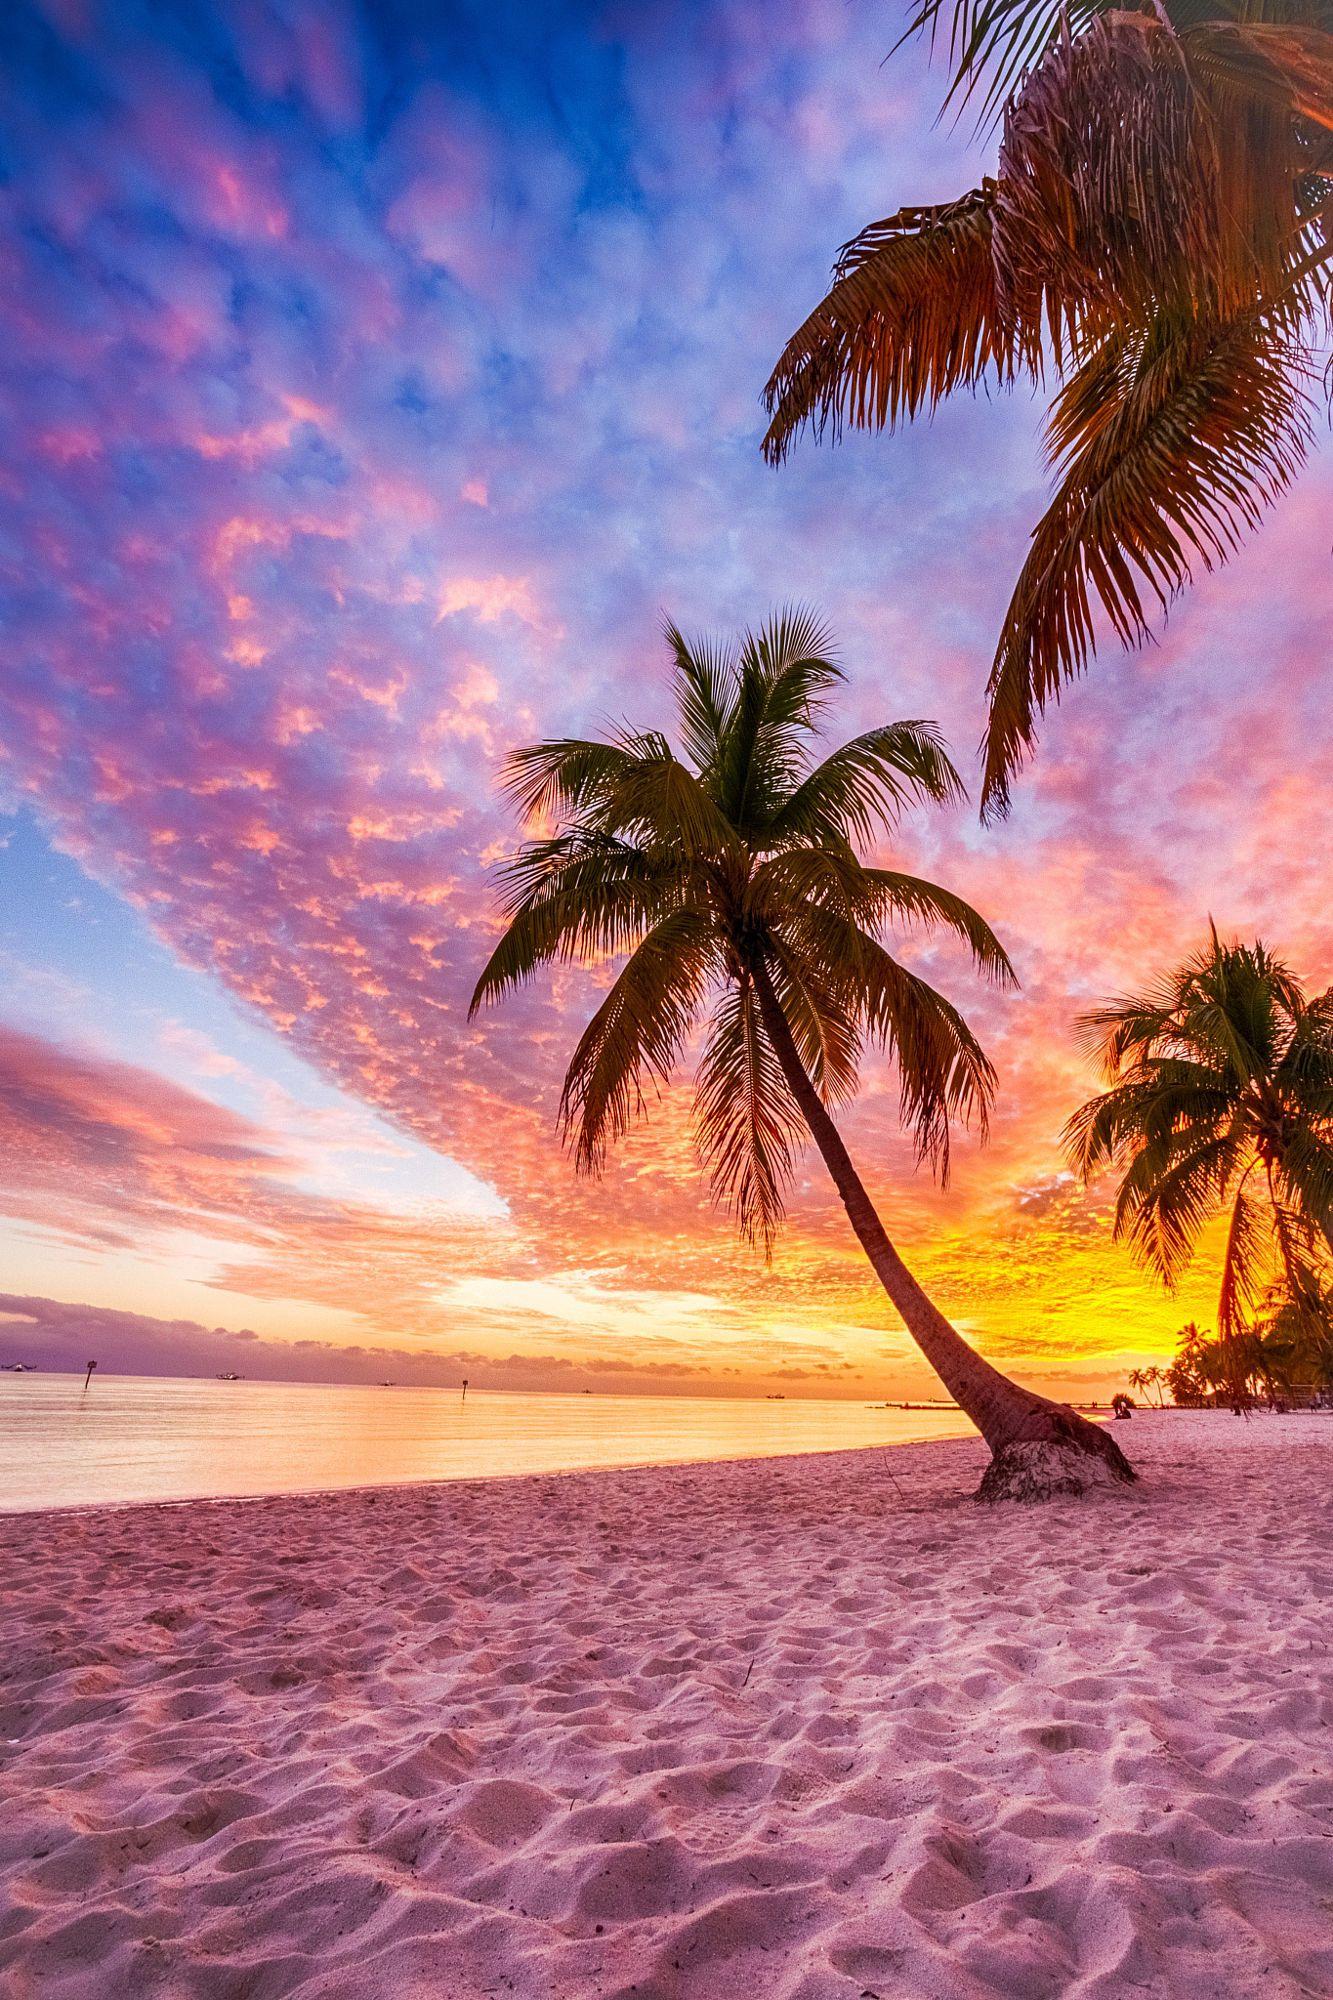 Captured This Shot Of Sunset At Keywest Florida